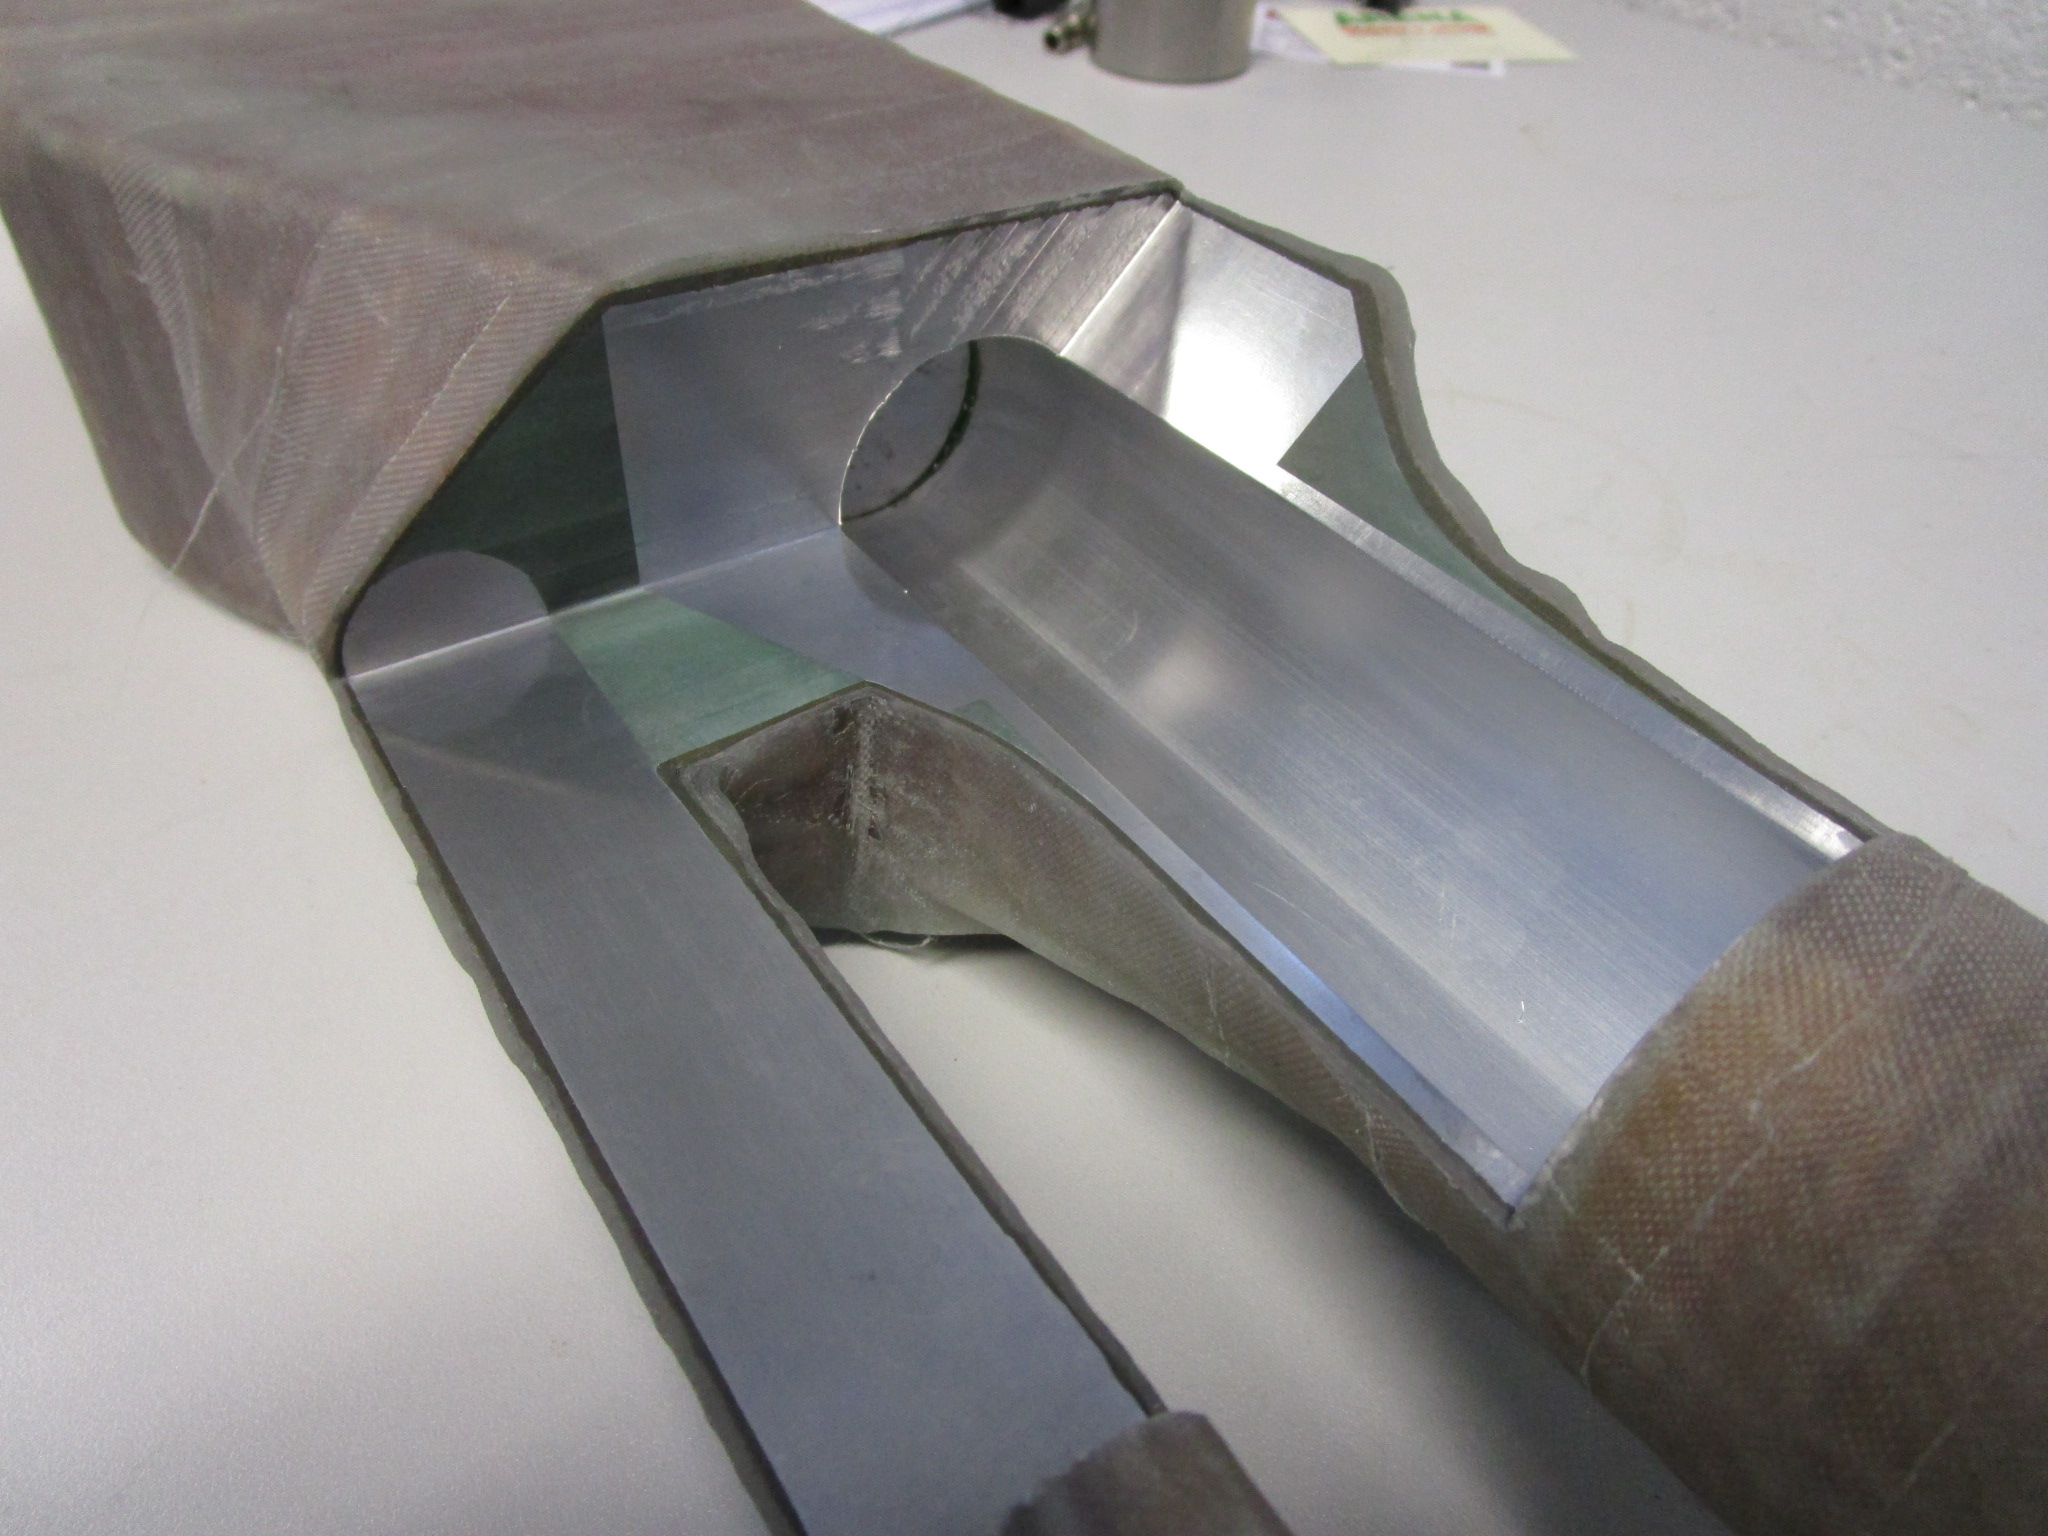 Superconducting buzzbar